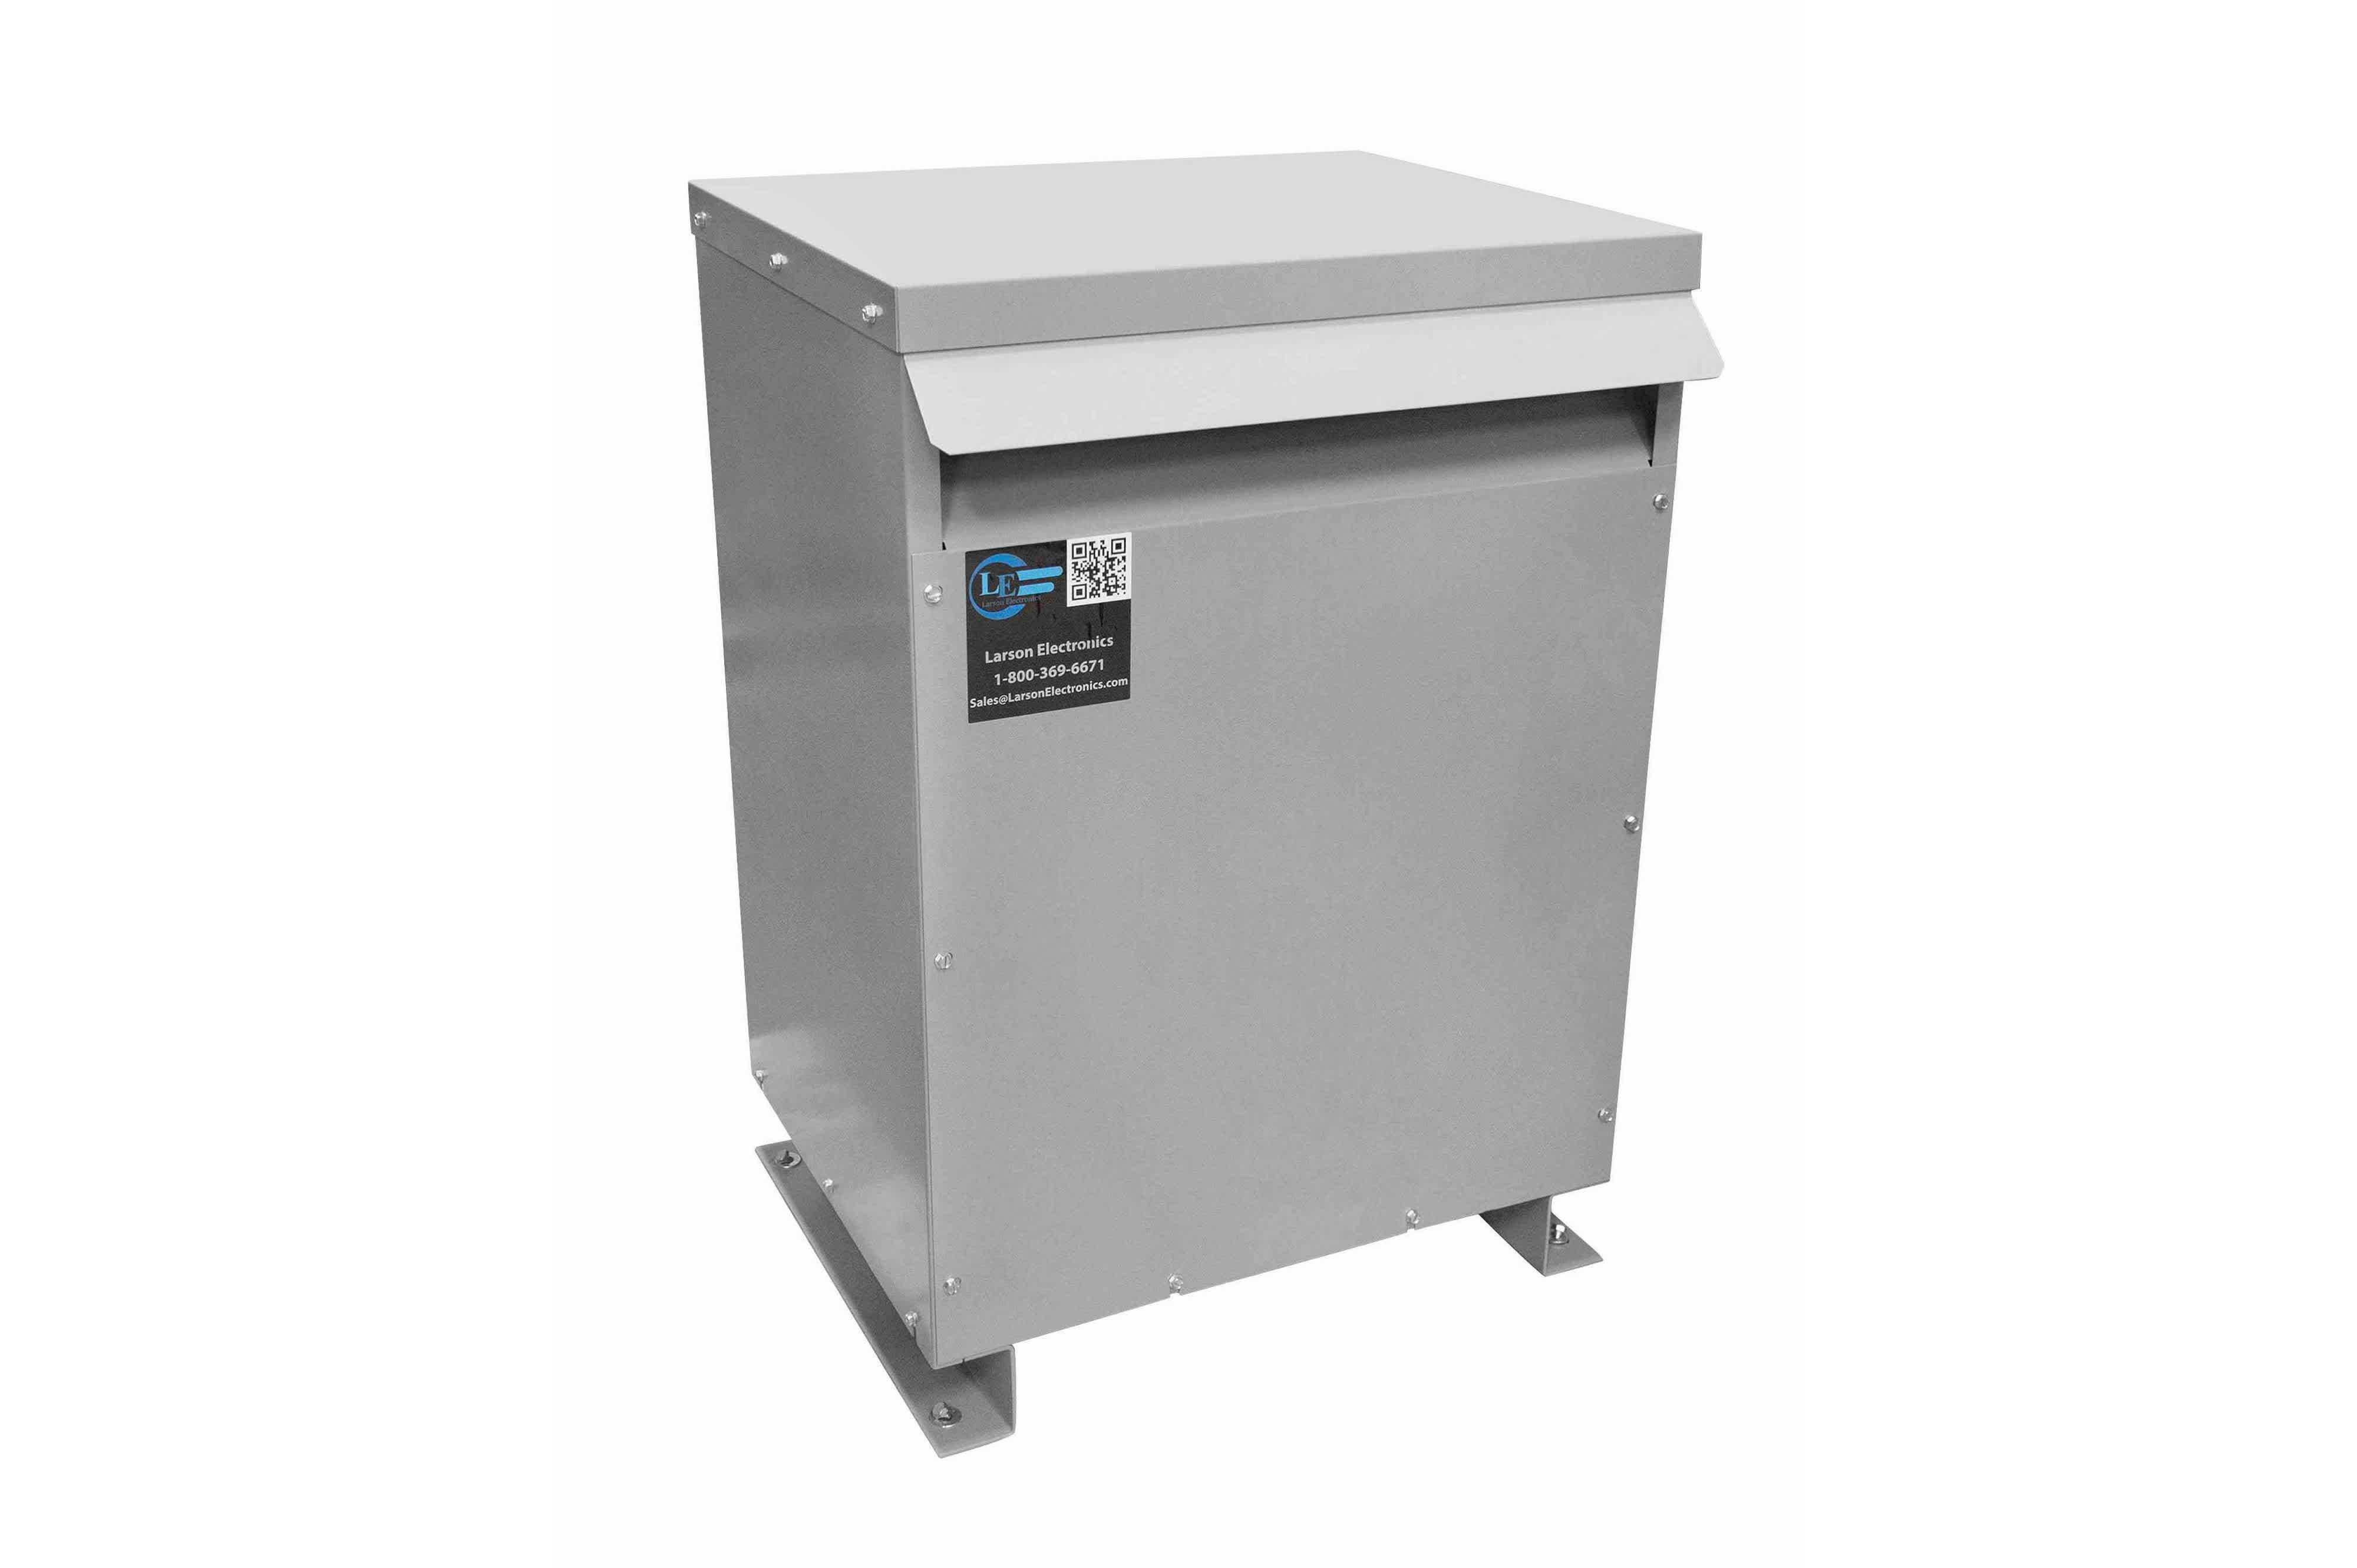 250 kVA 3PH Isolation Transformer, 415V Wye Primary, 240V Delta Secondary, N3R, Ventilated, 60 Hz